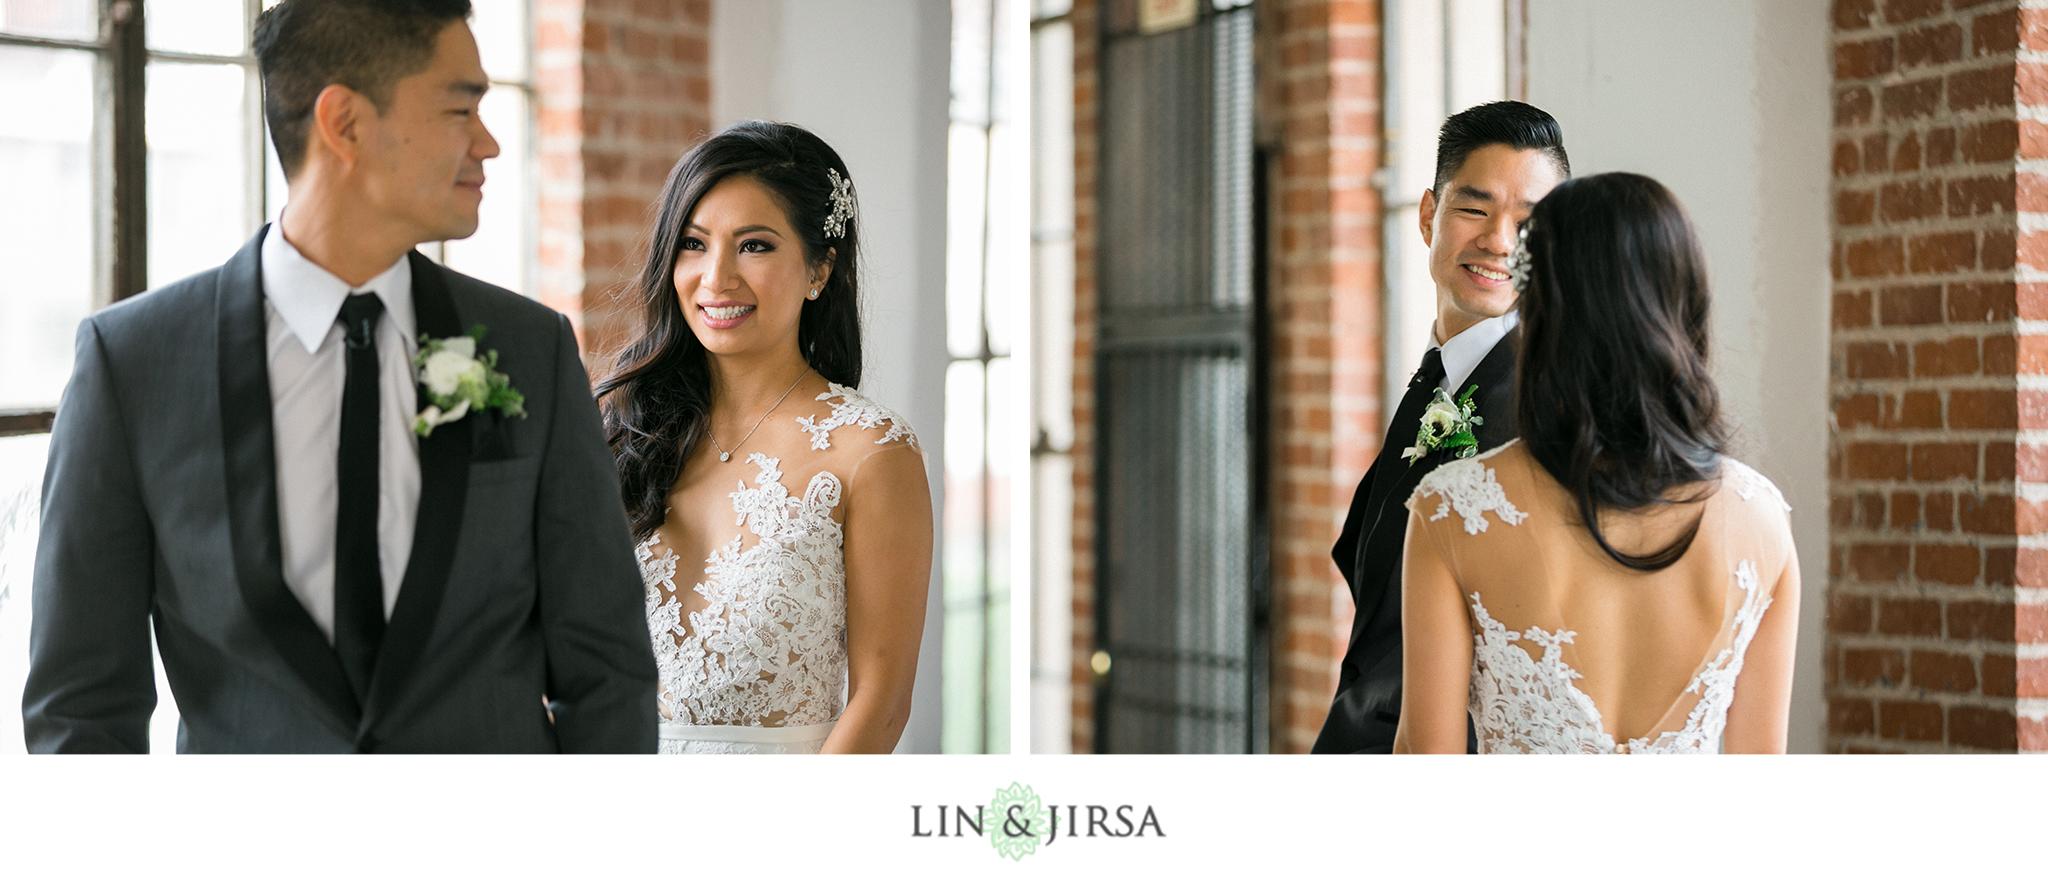 10-hudson-loft-downtown-los-angeles-wedding-photography